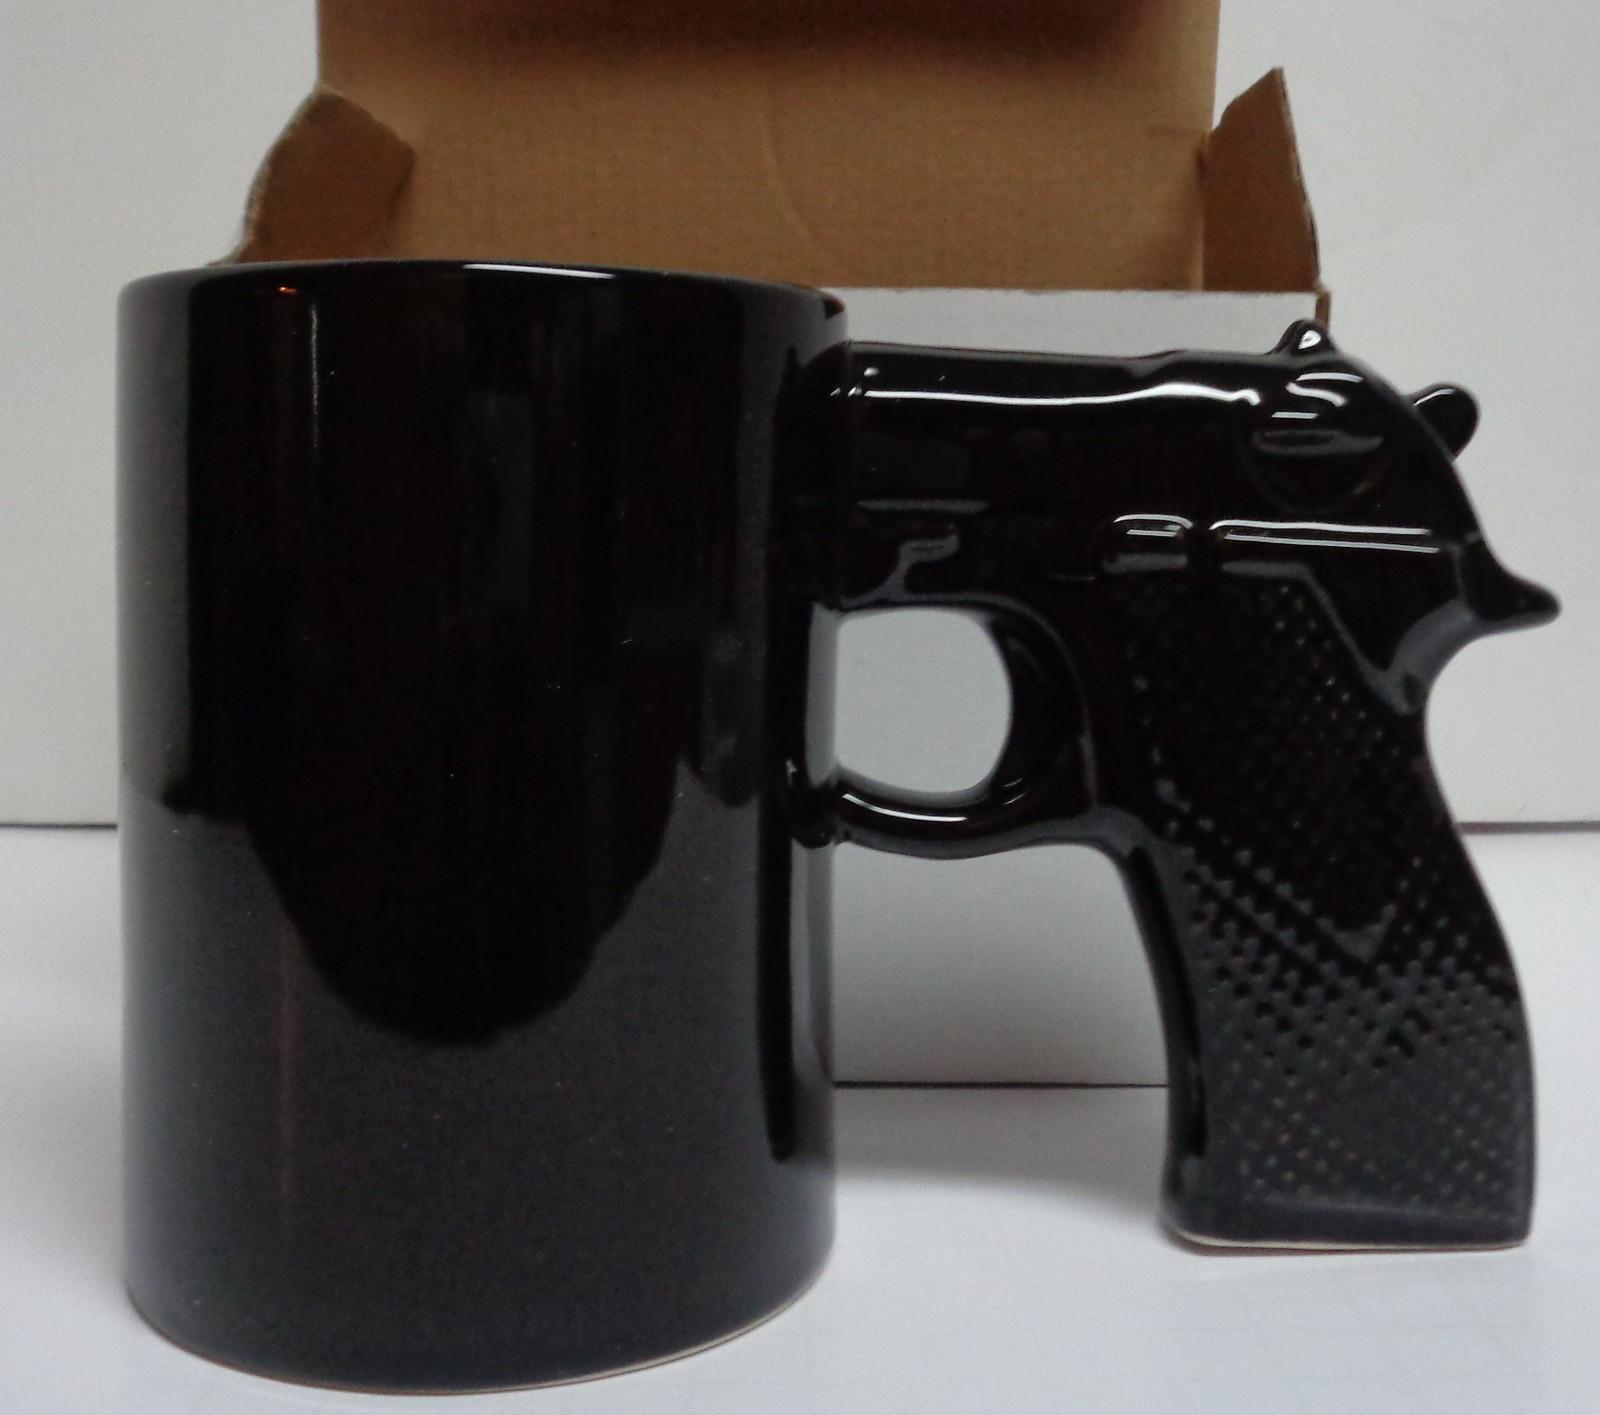 GUN MUG Handgun Grip Coffee Mug Novelty NIB Black Ceramic